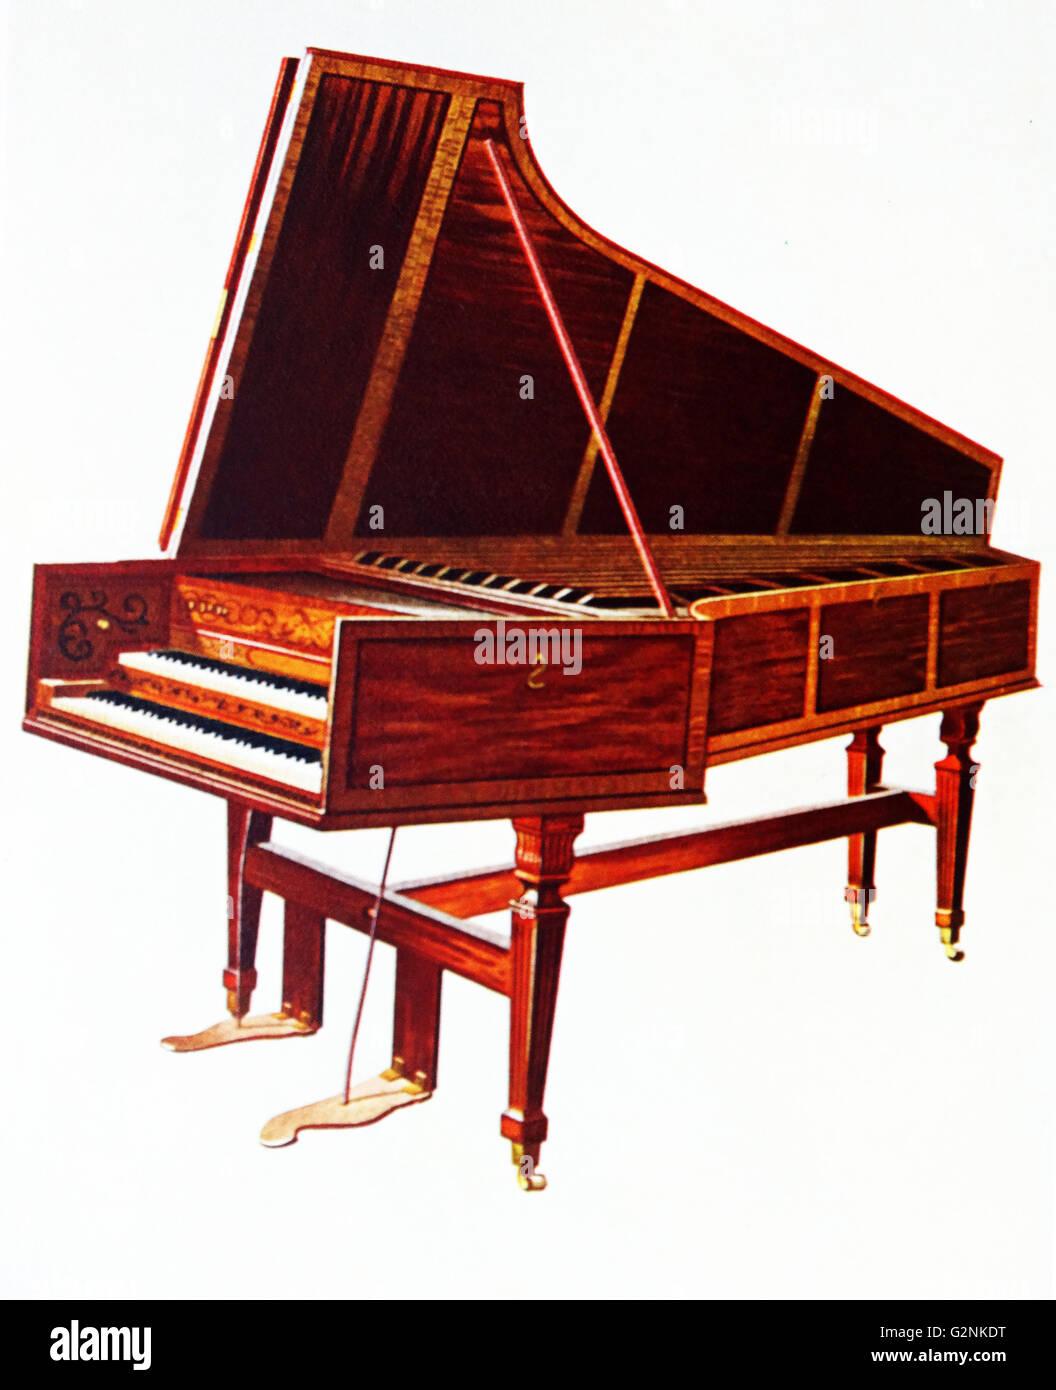 The Empress Harpsichord - Stock Image